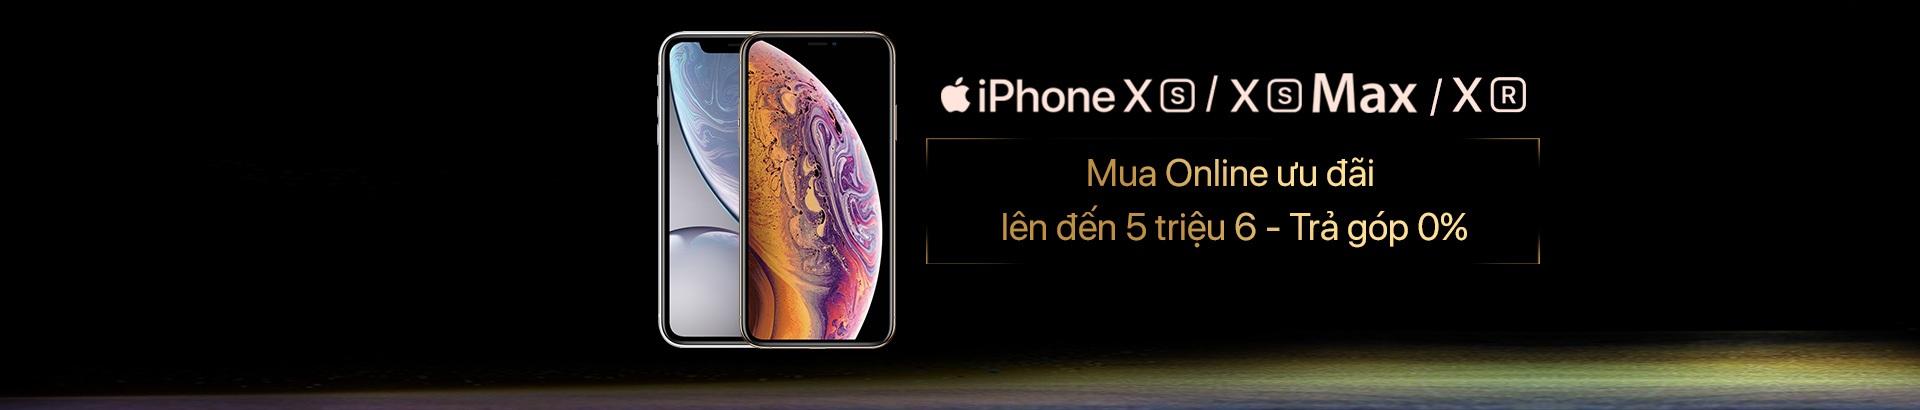 Khuyến mãi lớn khi mua iPhone XS/ XS Max/ XR